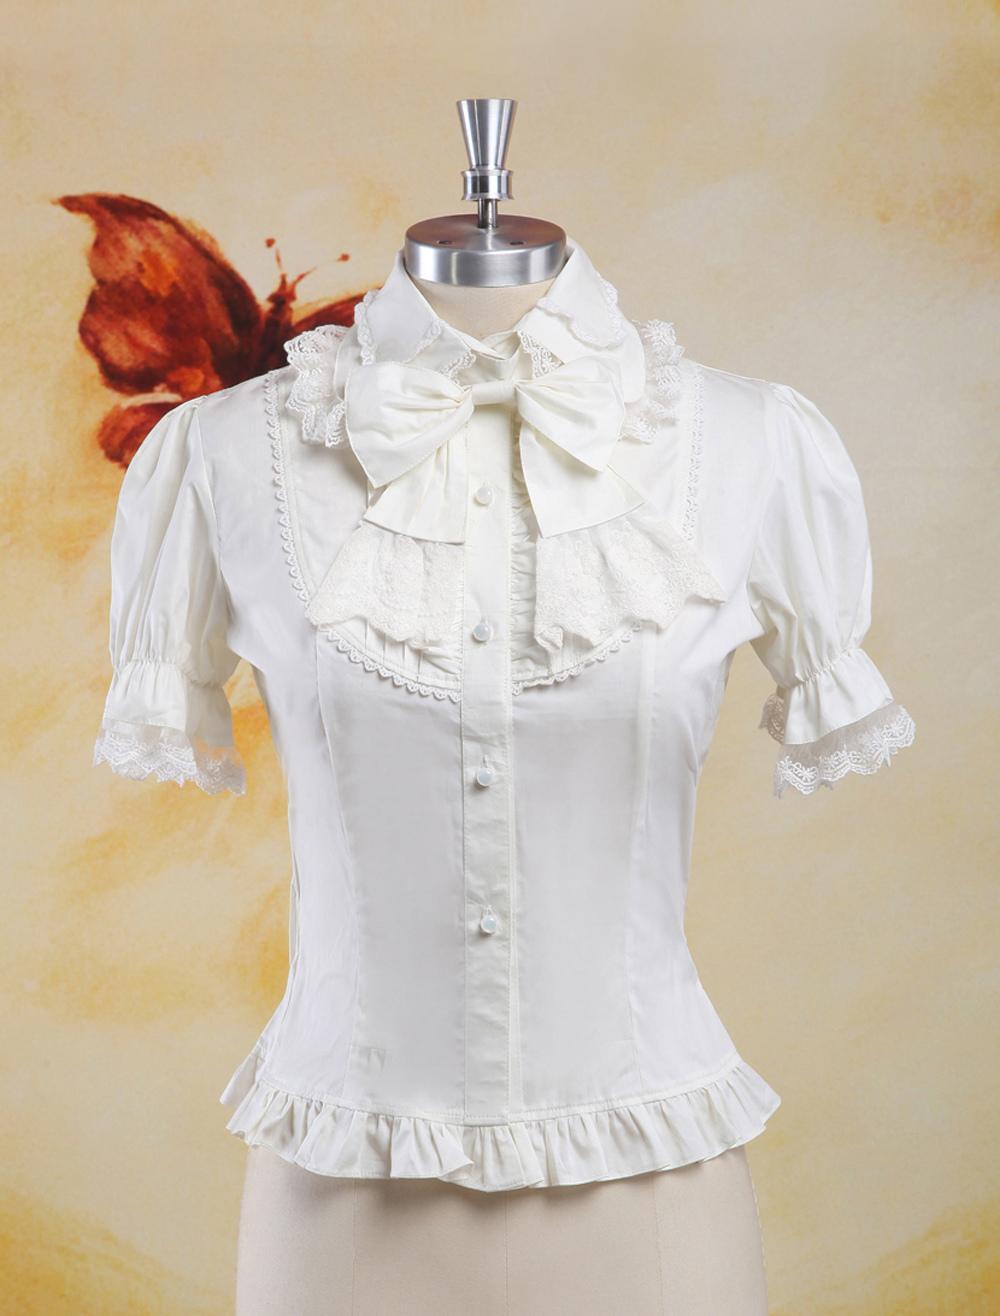 Sweet White Cotton Lolita Blouse Short Sleeves Lace Trim Bows Ruffles